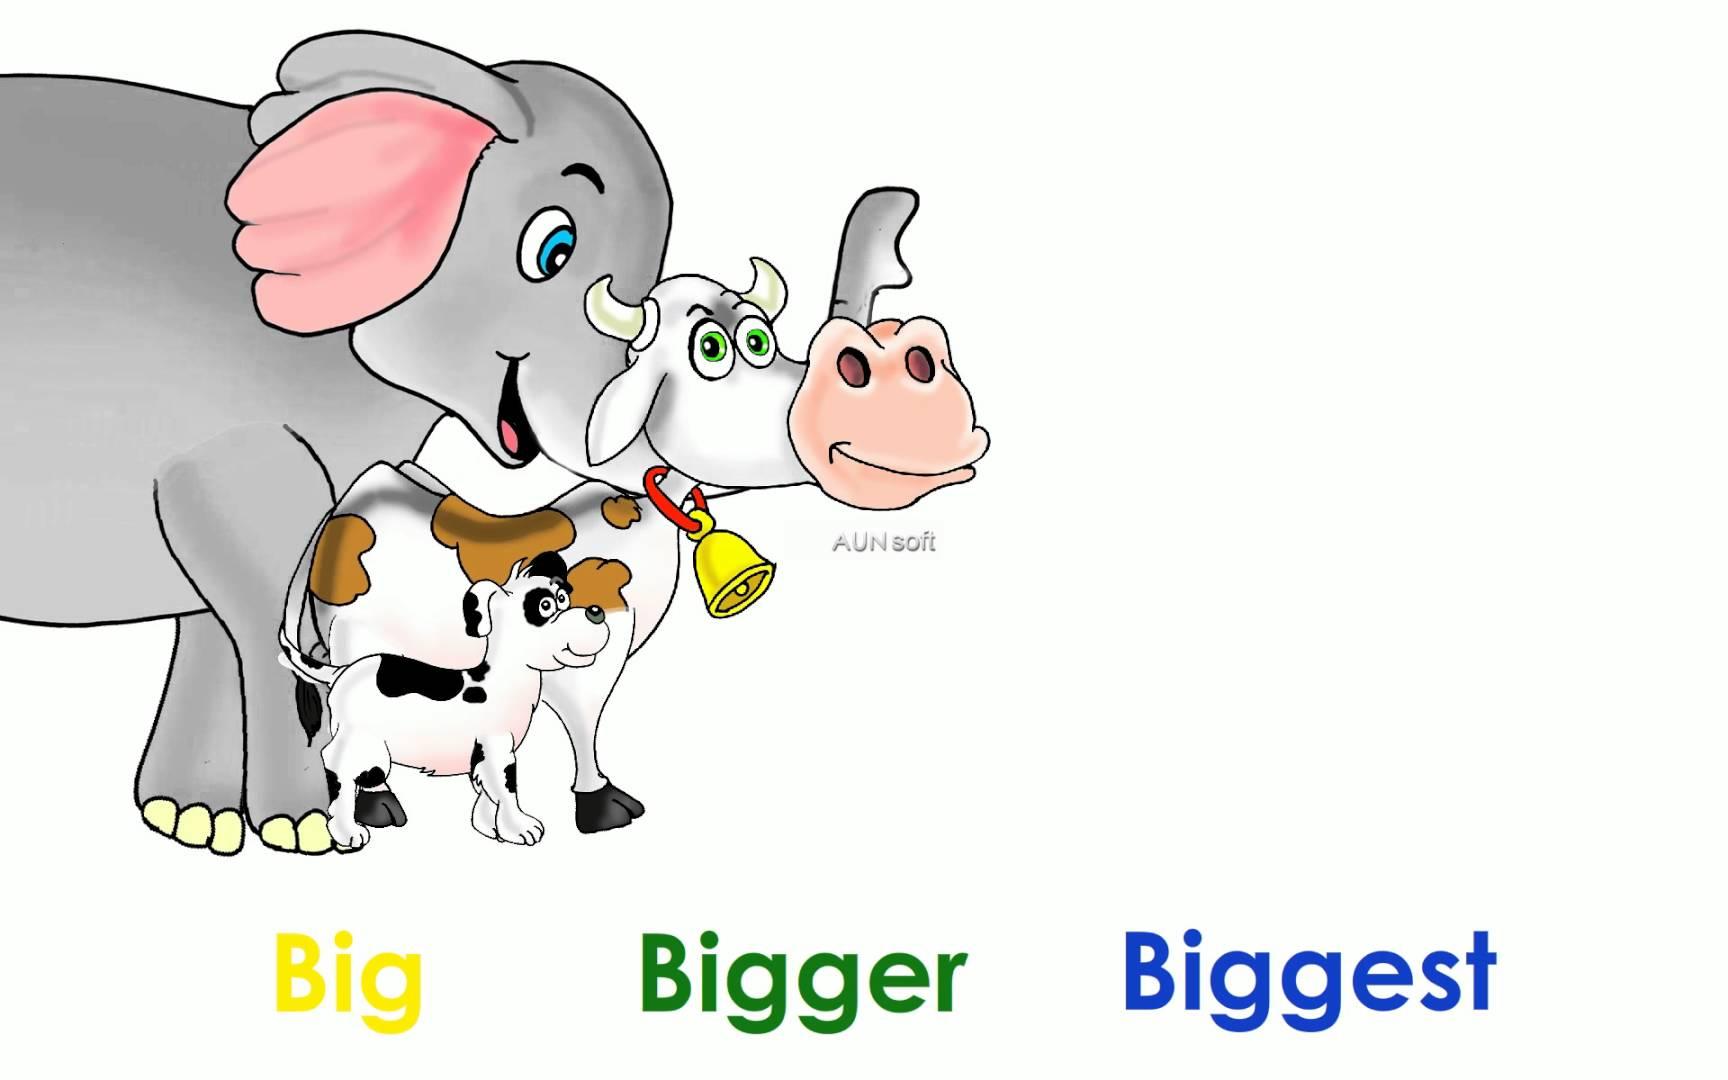 Biggest animation by best. Big clipart big bigger big